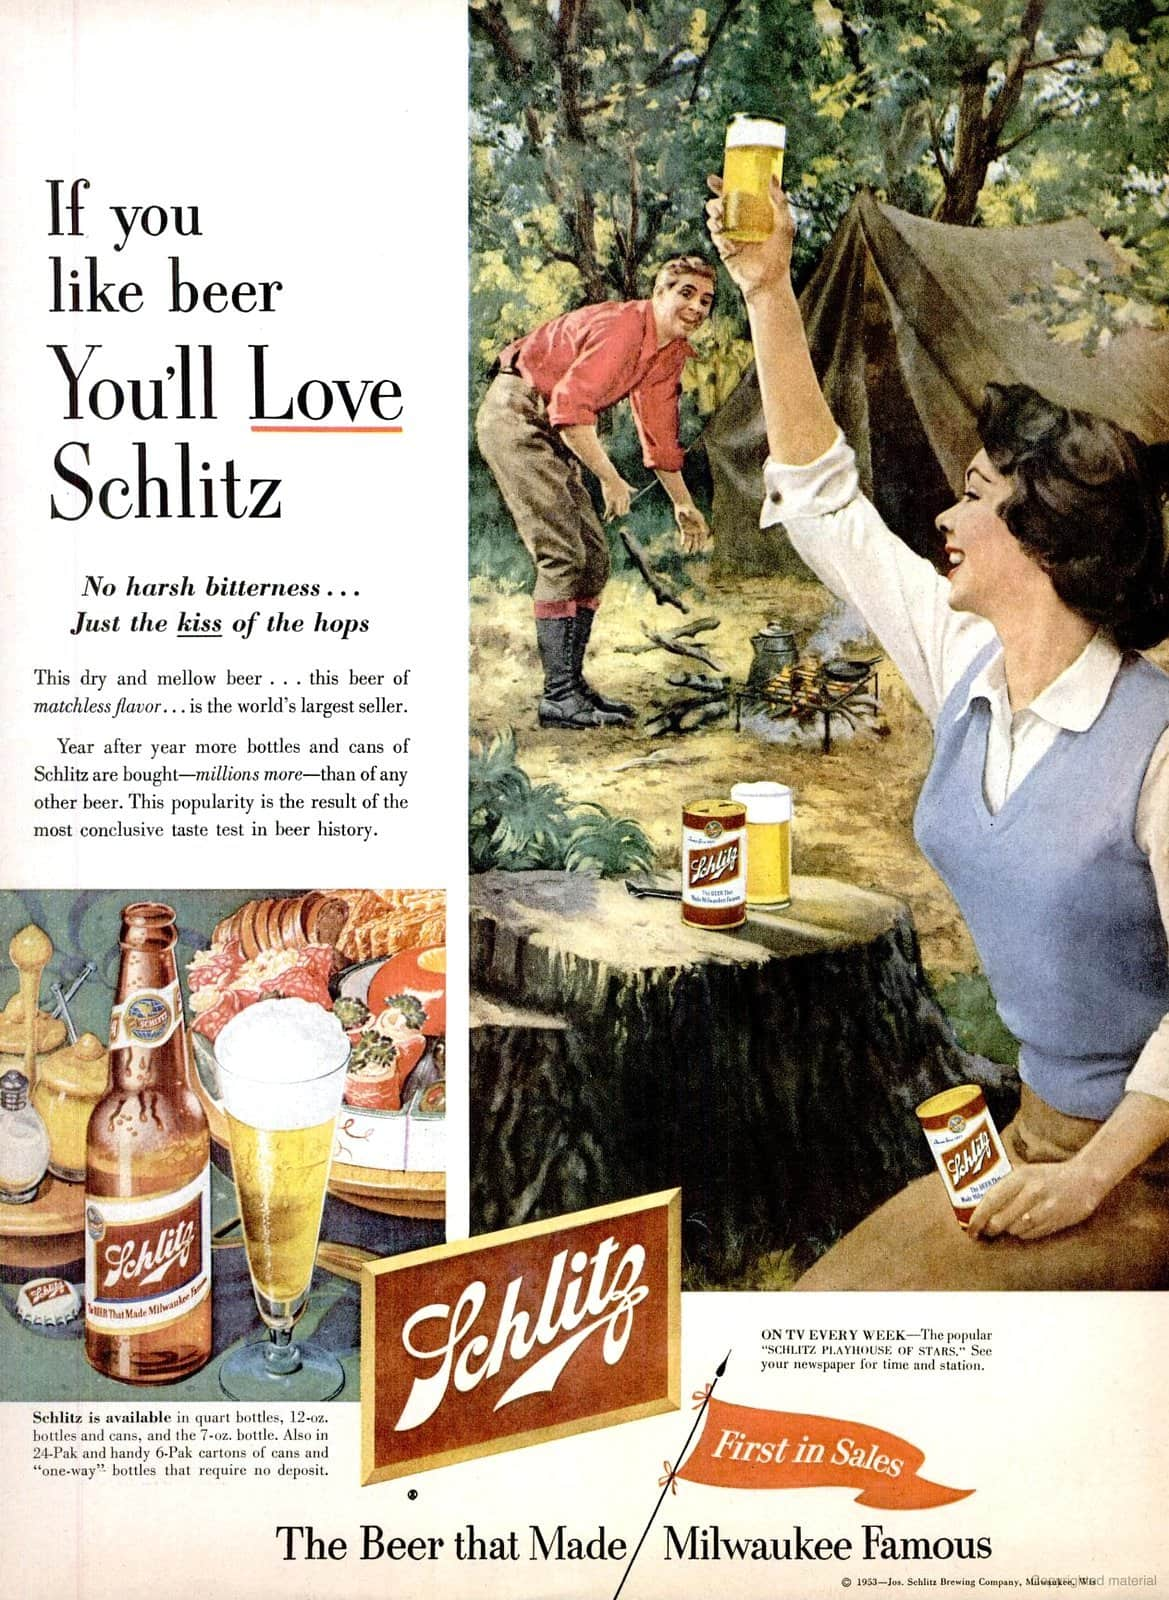 If you like beer (1953)